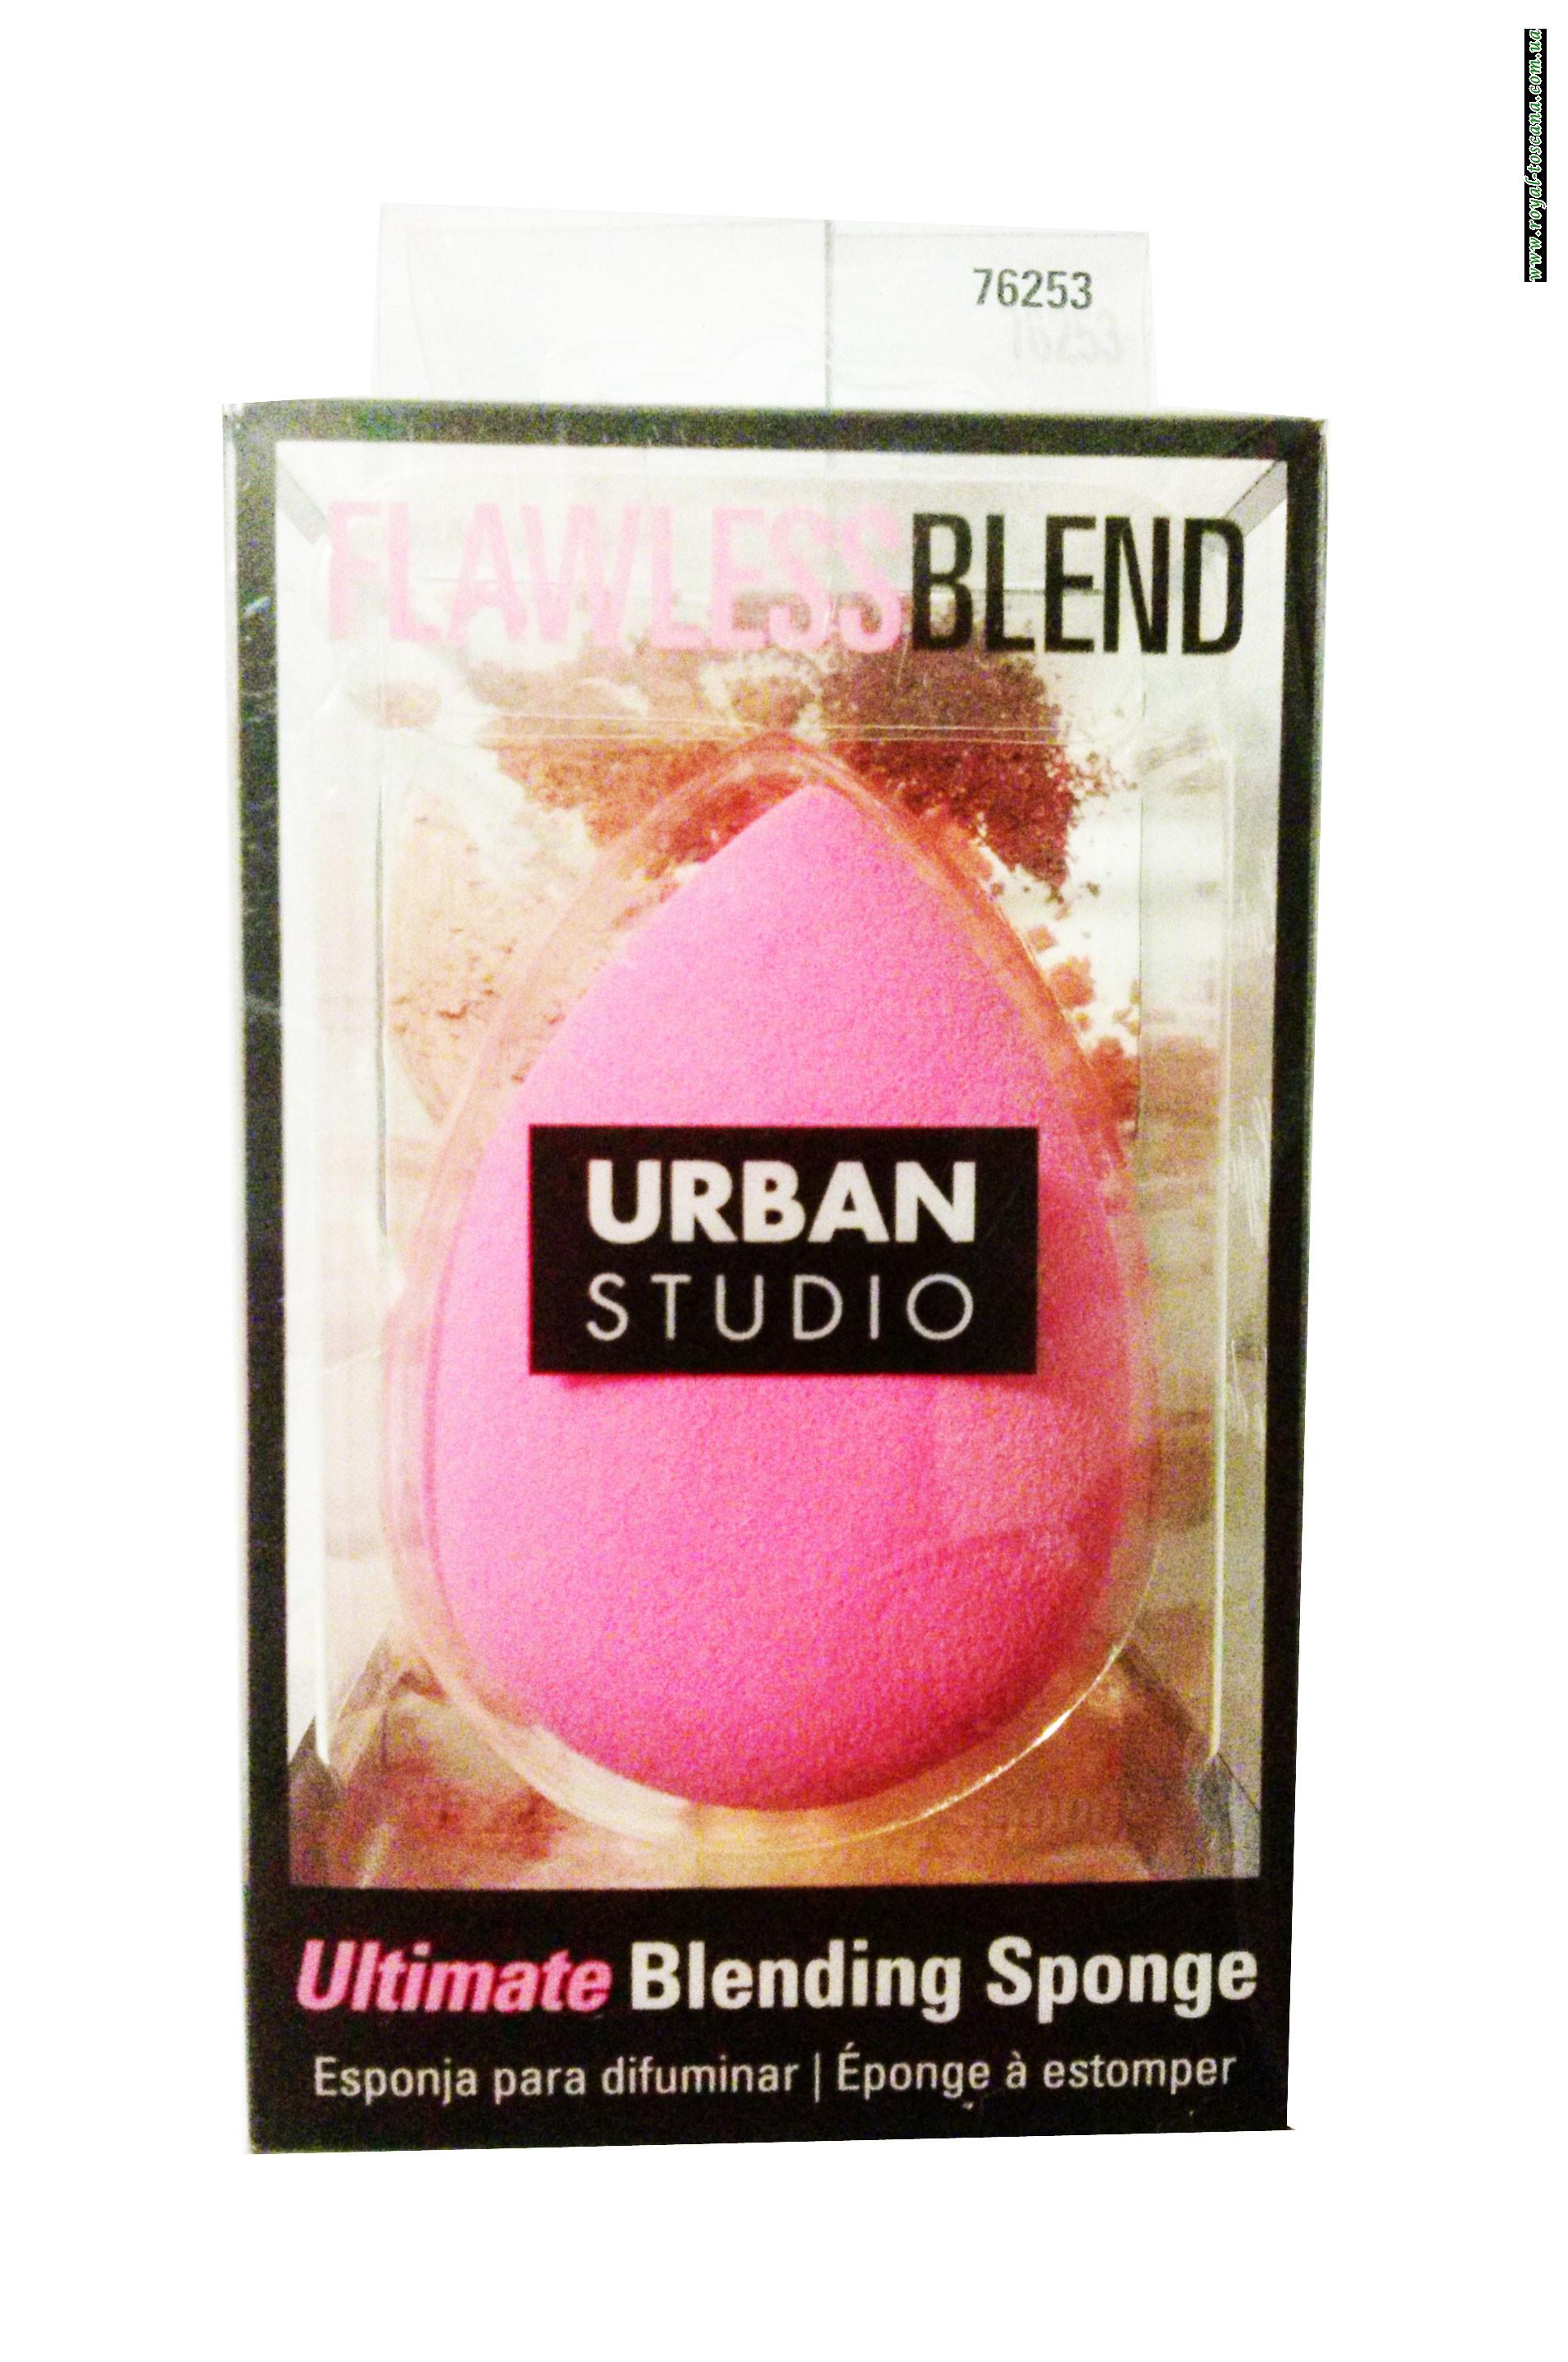 Косметический спонж для макияжа Urban Studio Flawless Blendn Ultimate Blending Sponge